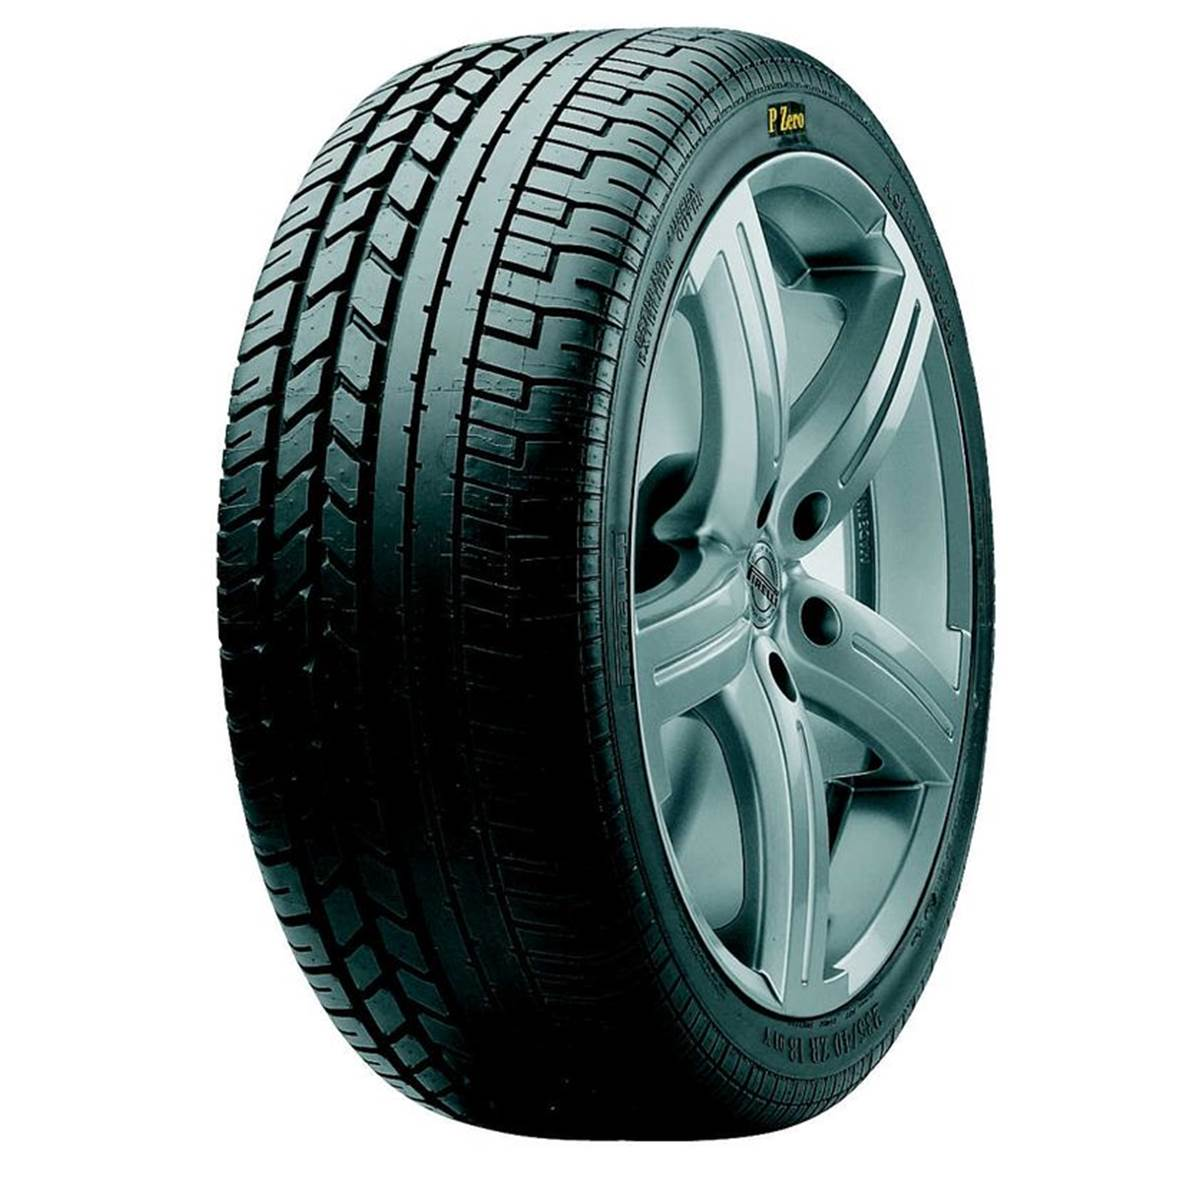 Pneu Pirelli 285/40R17 100Y Pzero Asimmetrico